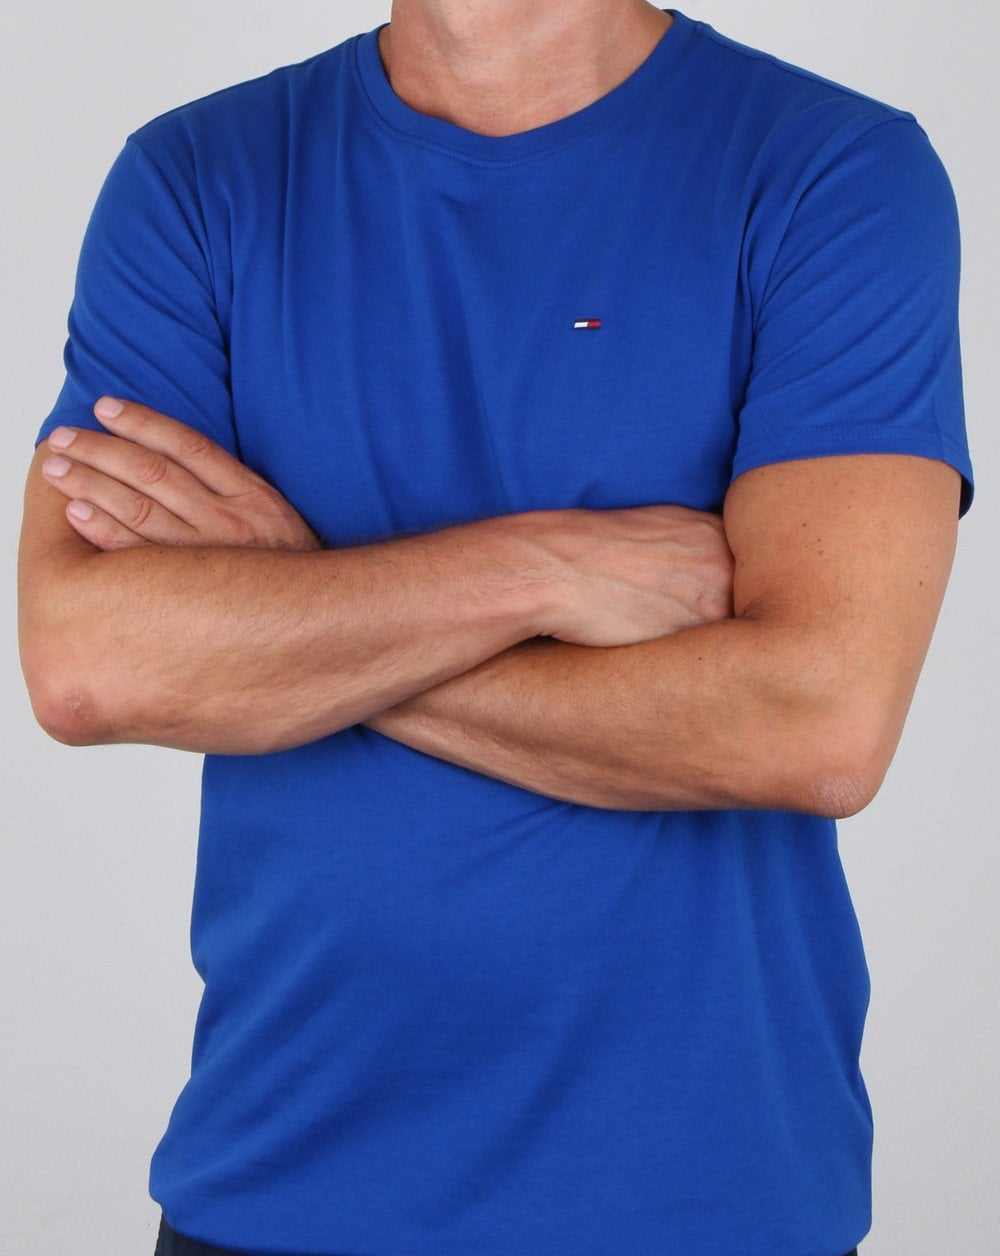 Tommy Hilfiger Mens Organic Cotton Crew Neck T-Shirt Blue